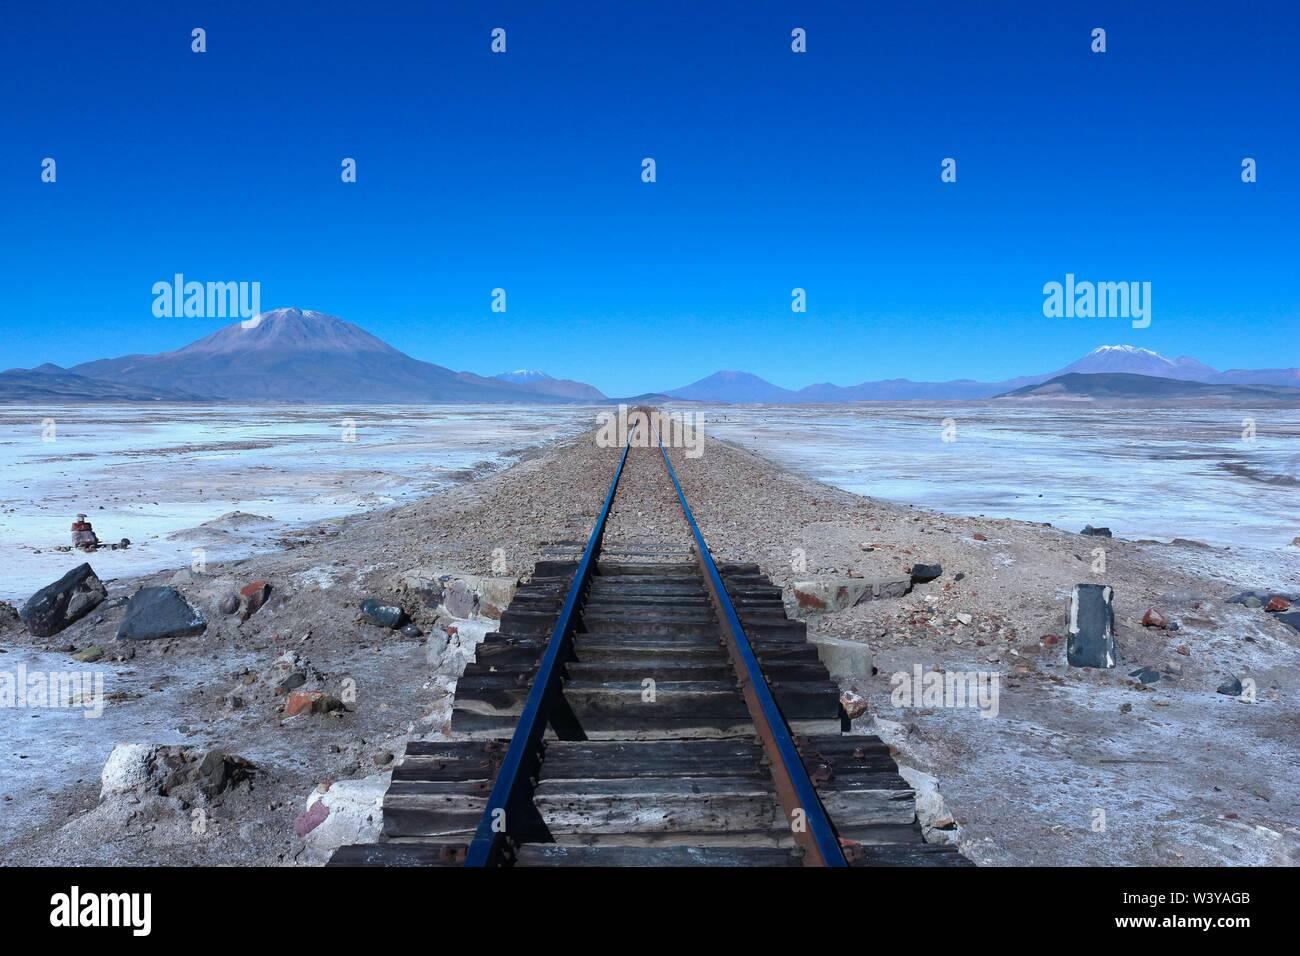 Train track to infinite with volcanos in the back, Salar de Uyuni, Bolivia Stock Photo